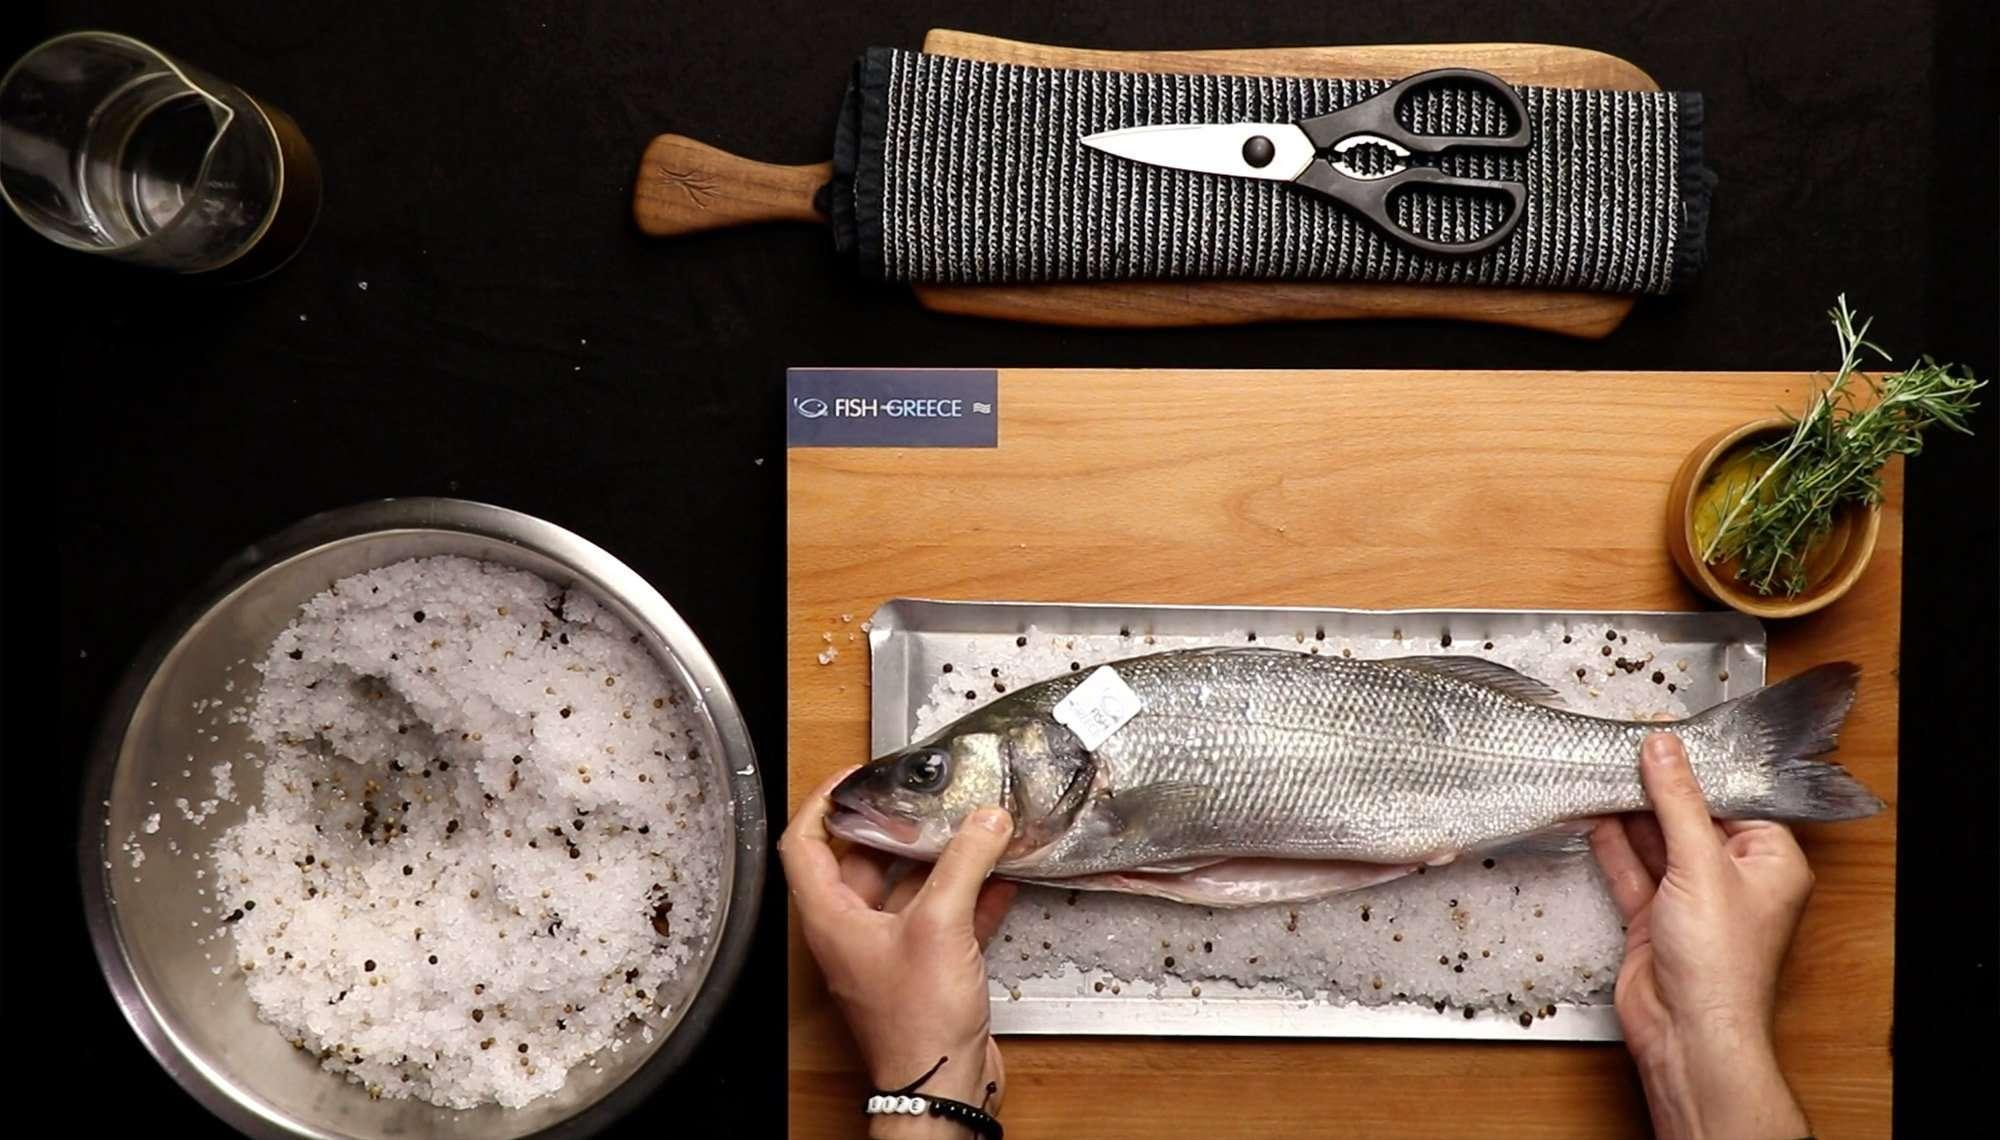 Fish from Greece τσιπούρα